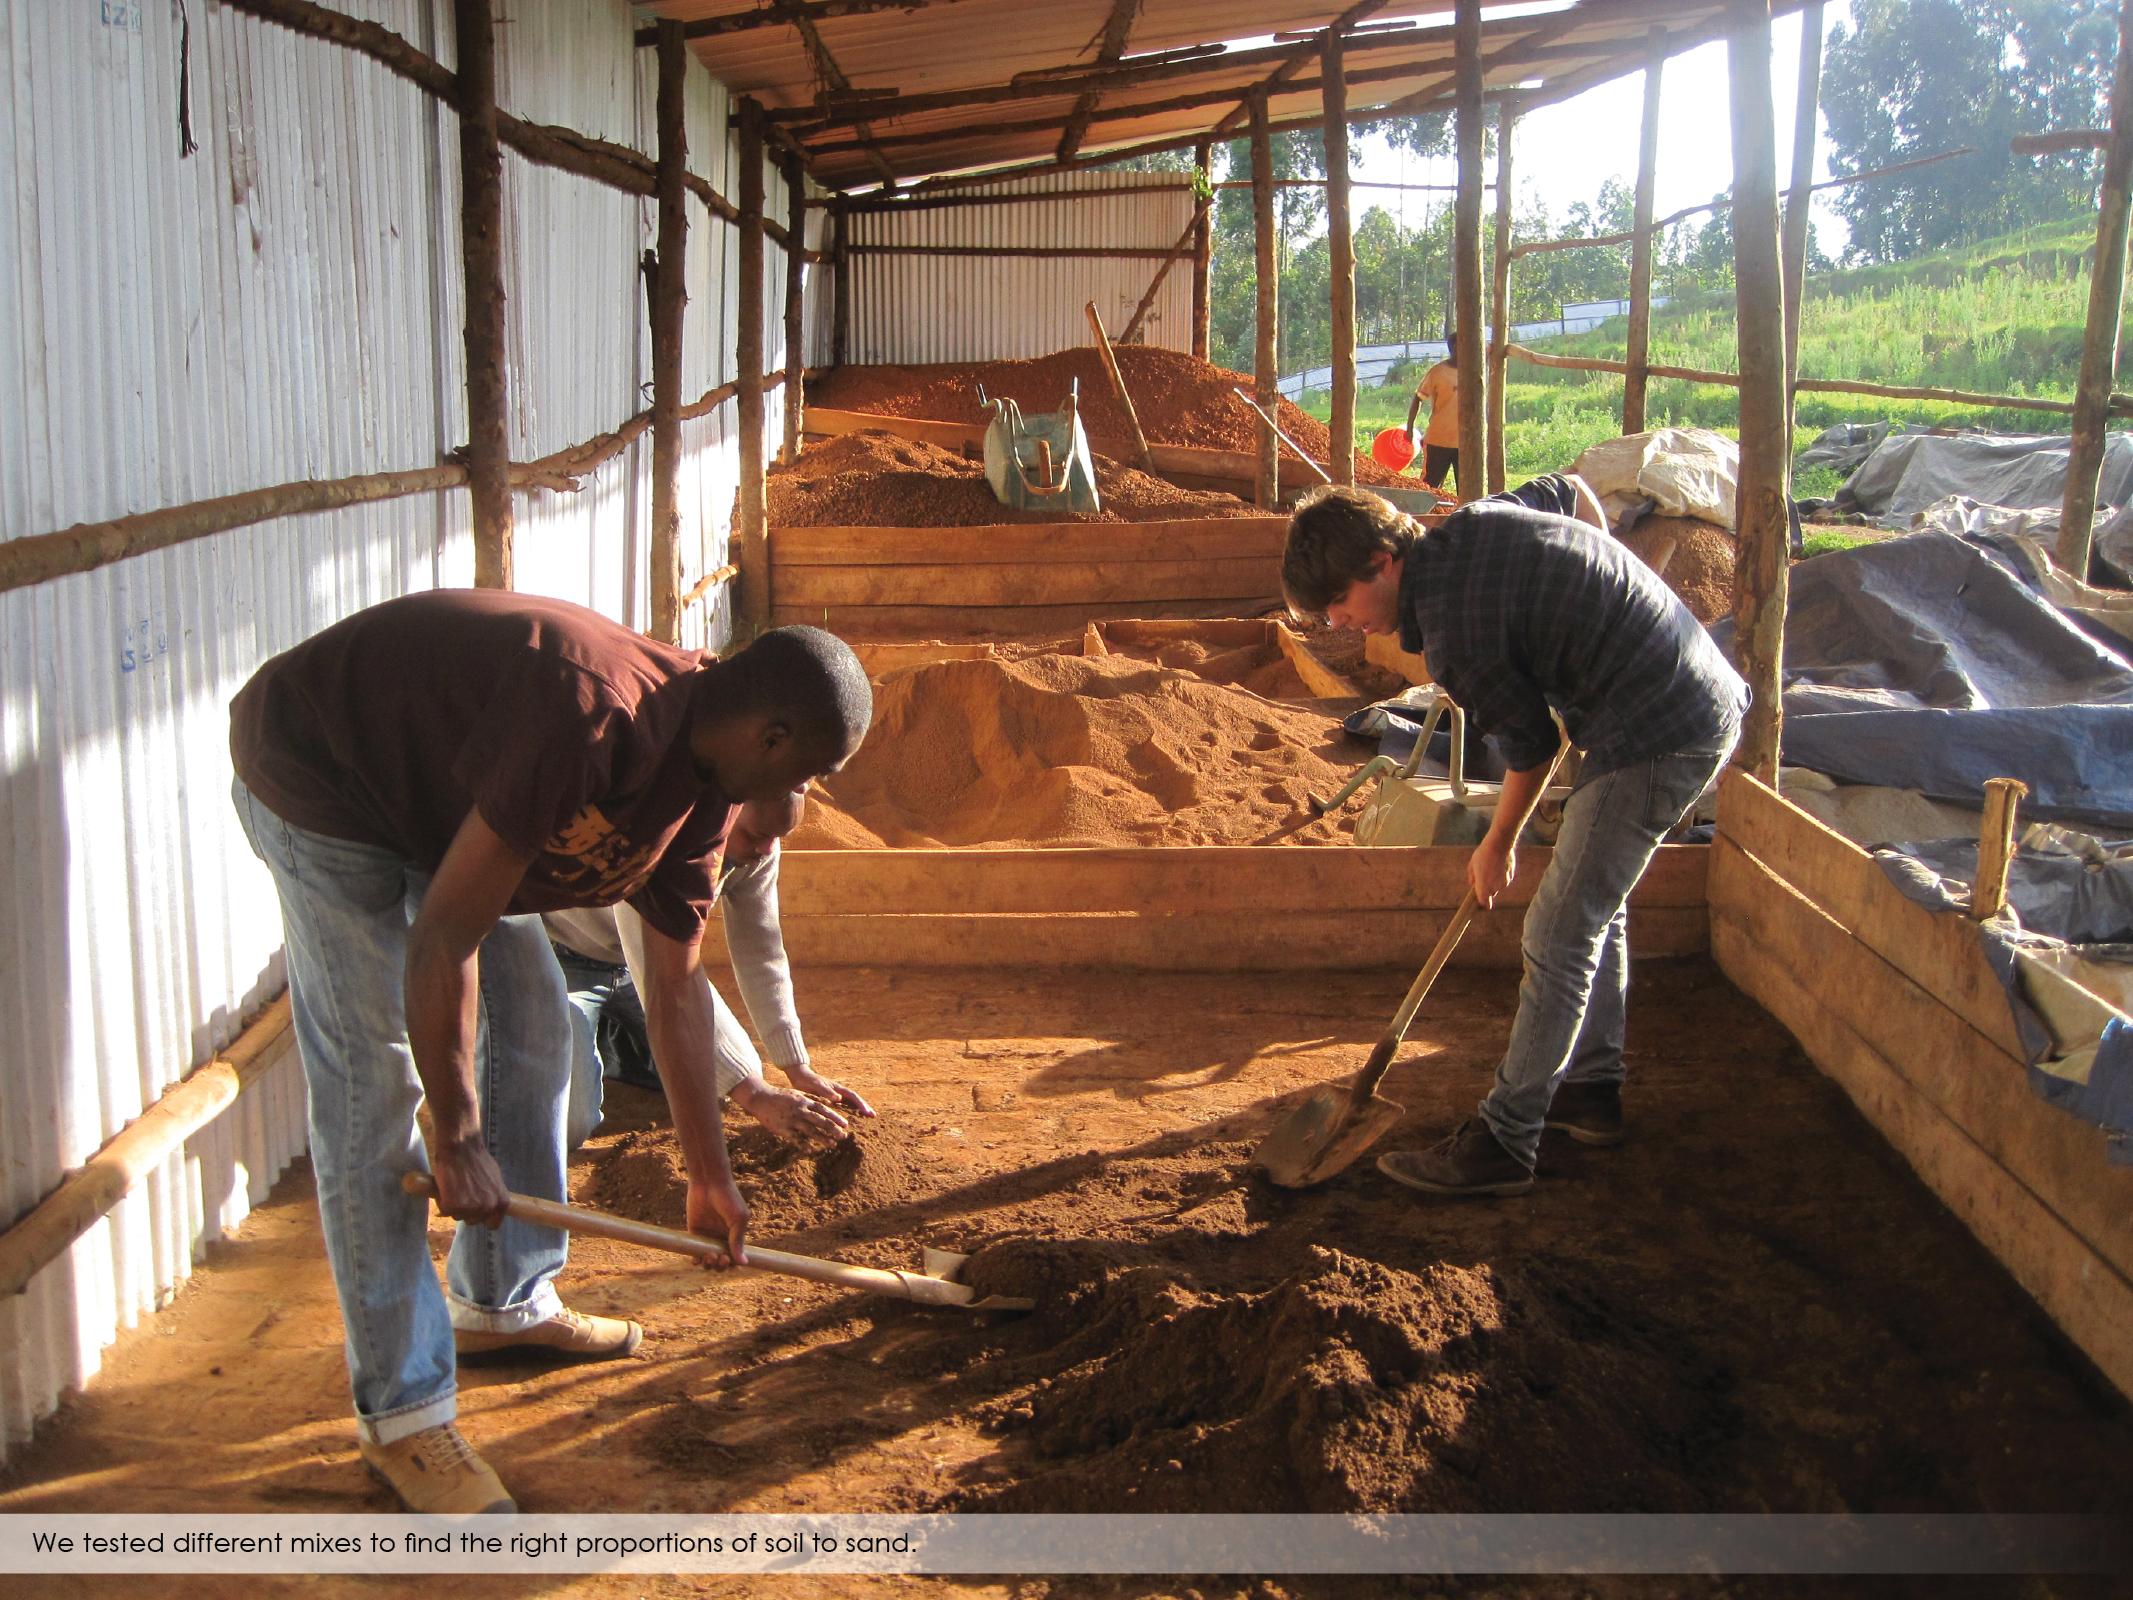 Gaugler_RwandaExperience_p11.jpg